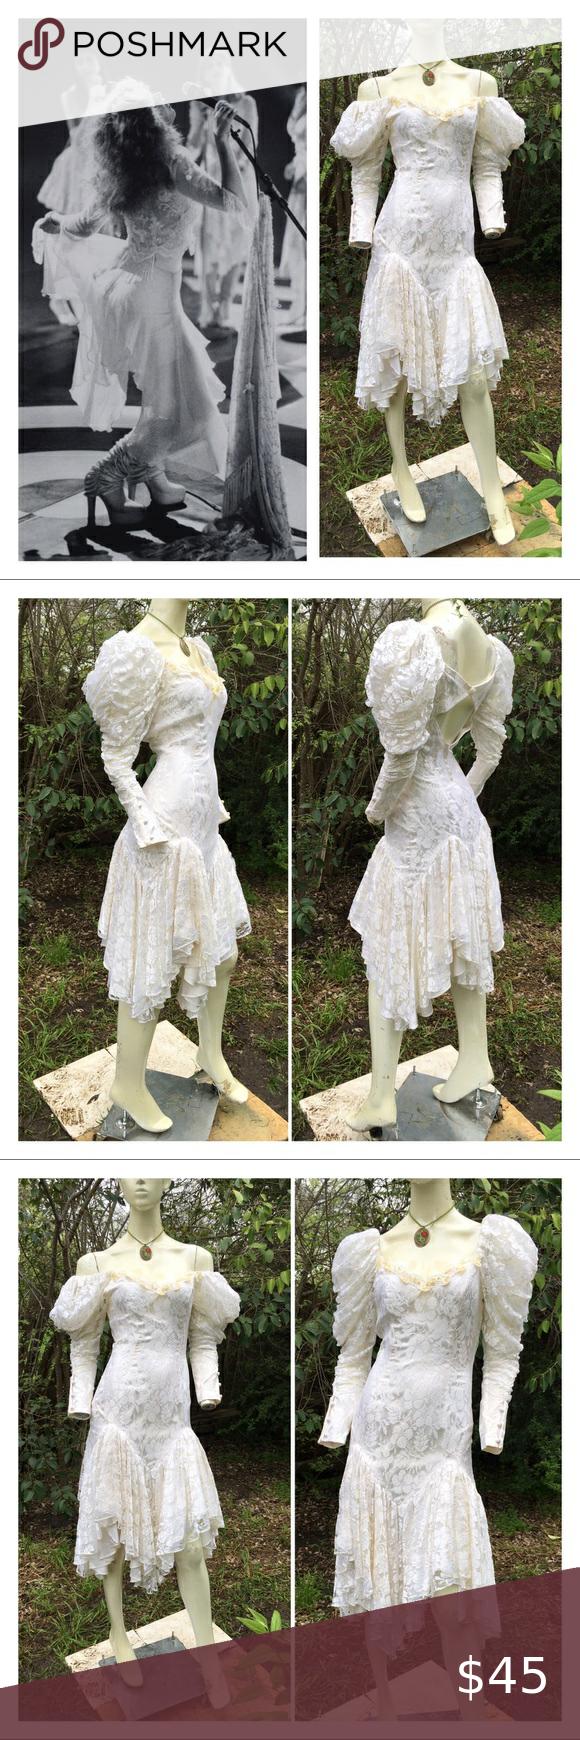 80s Stevie Nicks Madonna Lace Goth Romantic Dress Romantic Dress Romantic Dresses Vintage Dresses [ 1740 x 580 Pixel ]